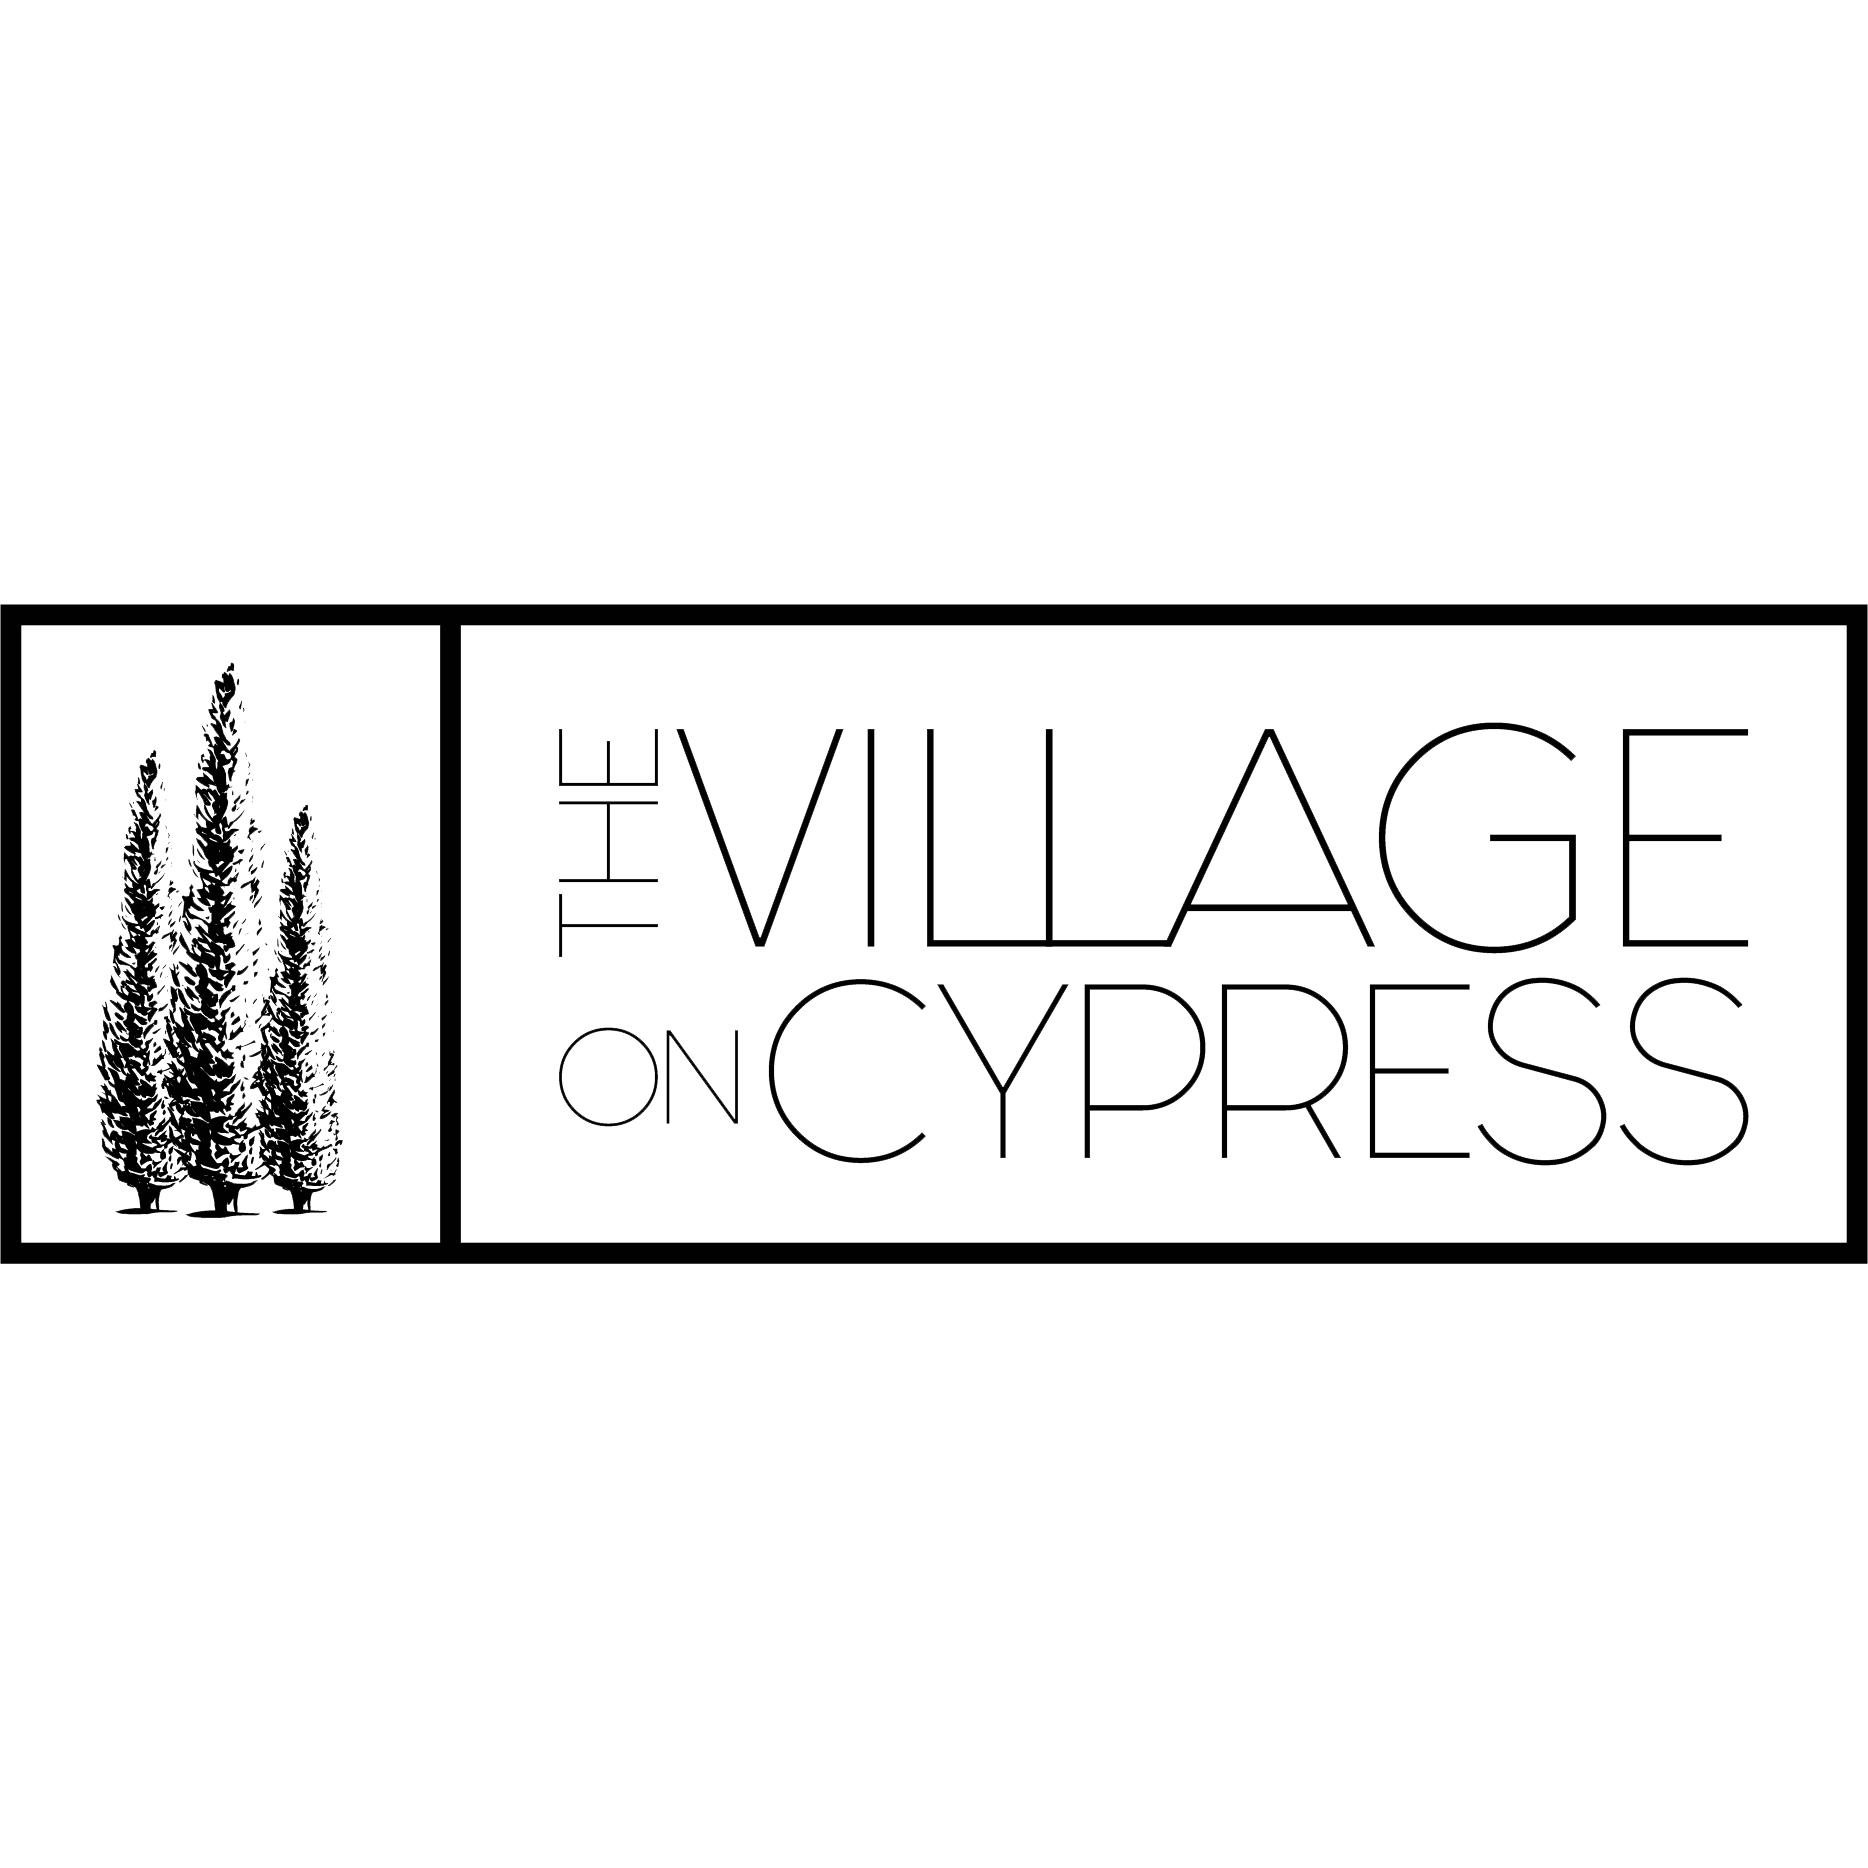 The Village on Cypress